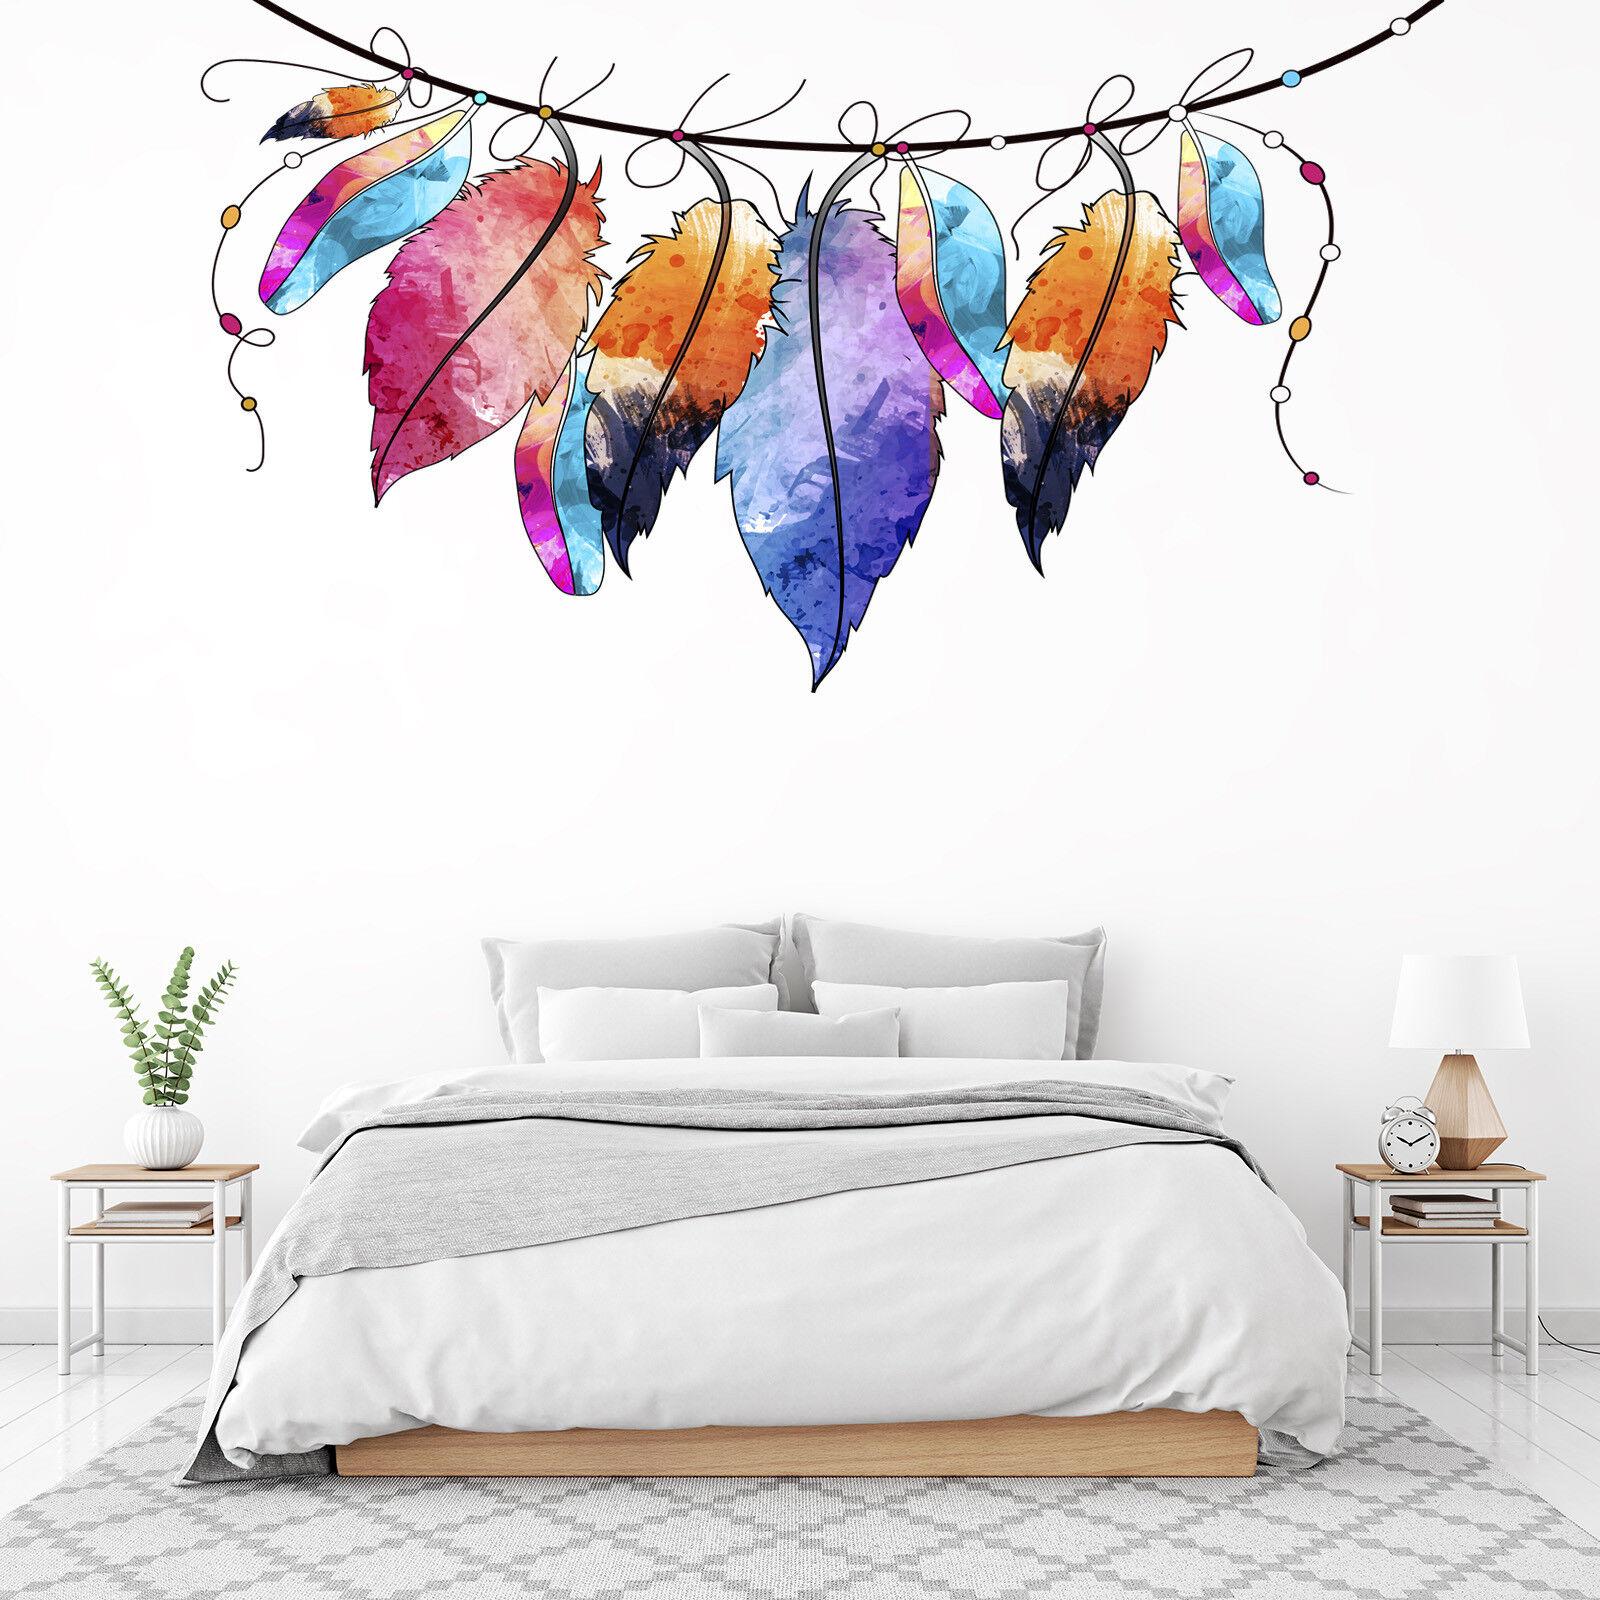 3D Graffiti Feathers 5 Wallpaper Murals Floor Wall Print Decal Wall Sticker AU